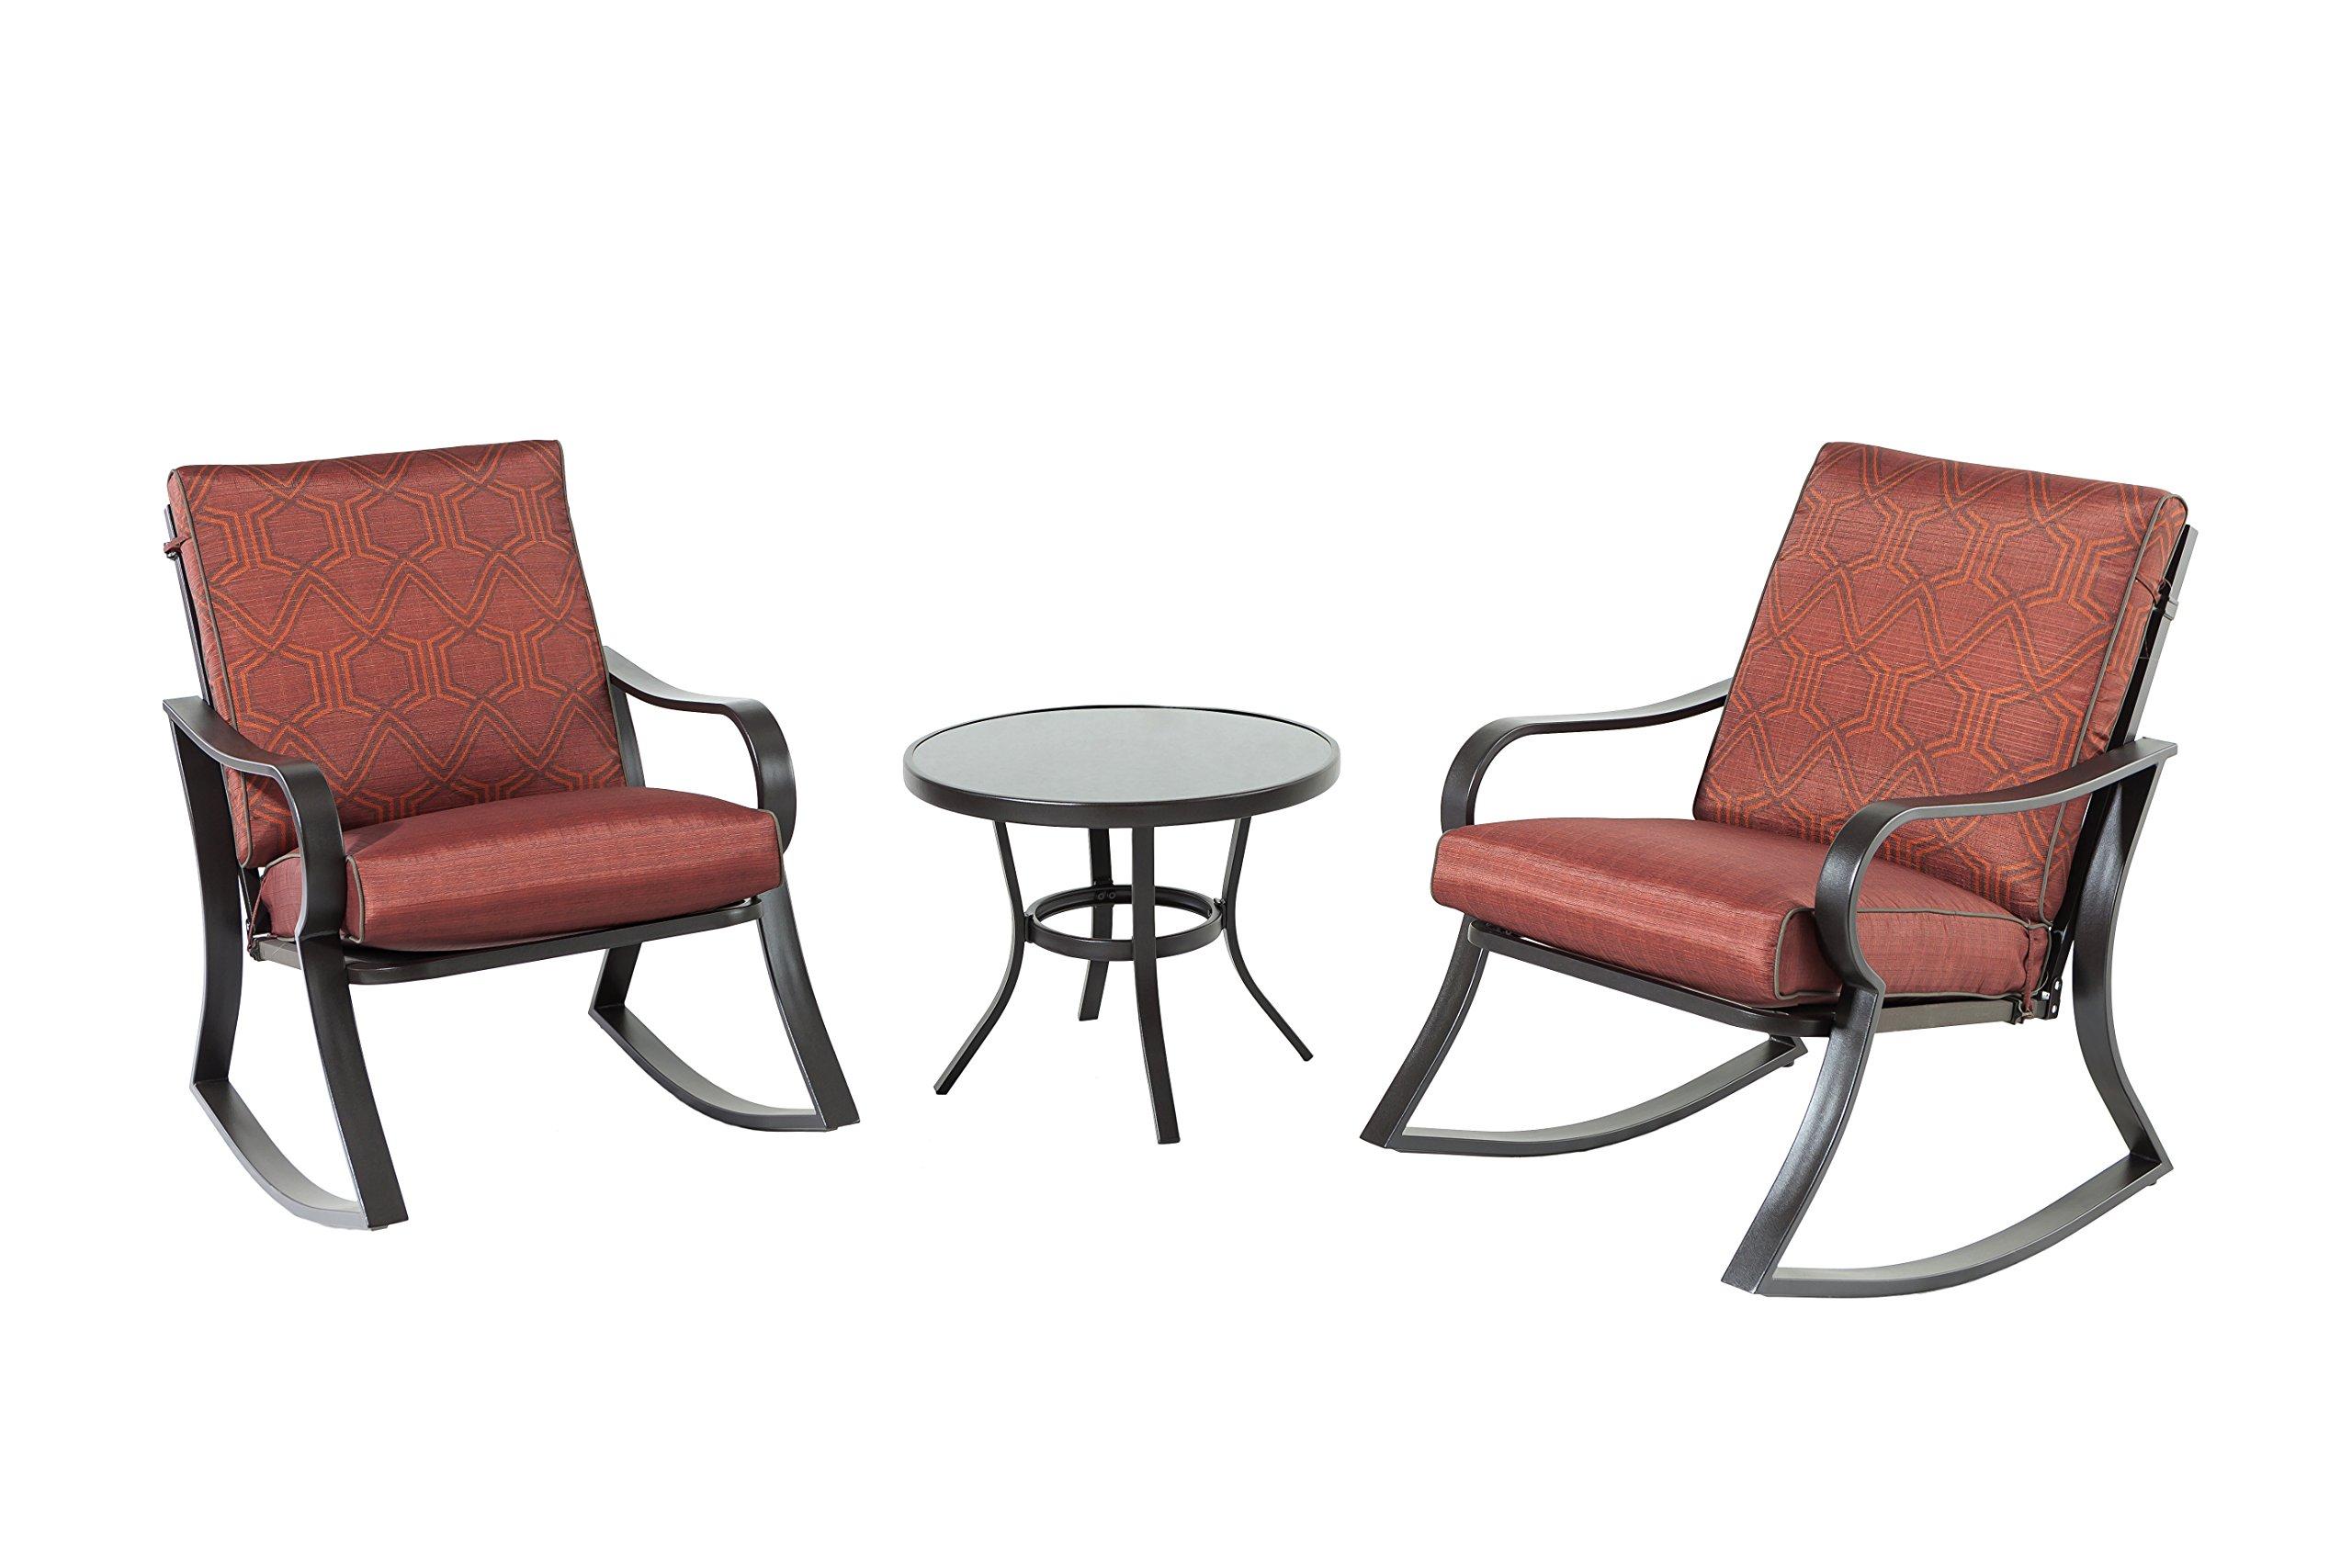 Backyard Classics Carrie 3-Piece Cushion Rocker Chair Set, Red by Backyard Classics